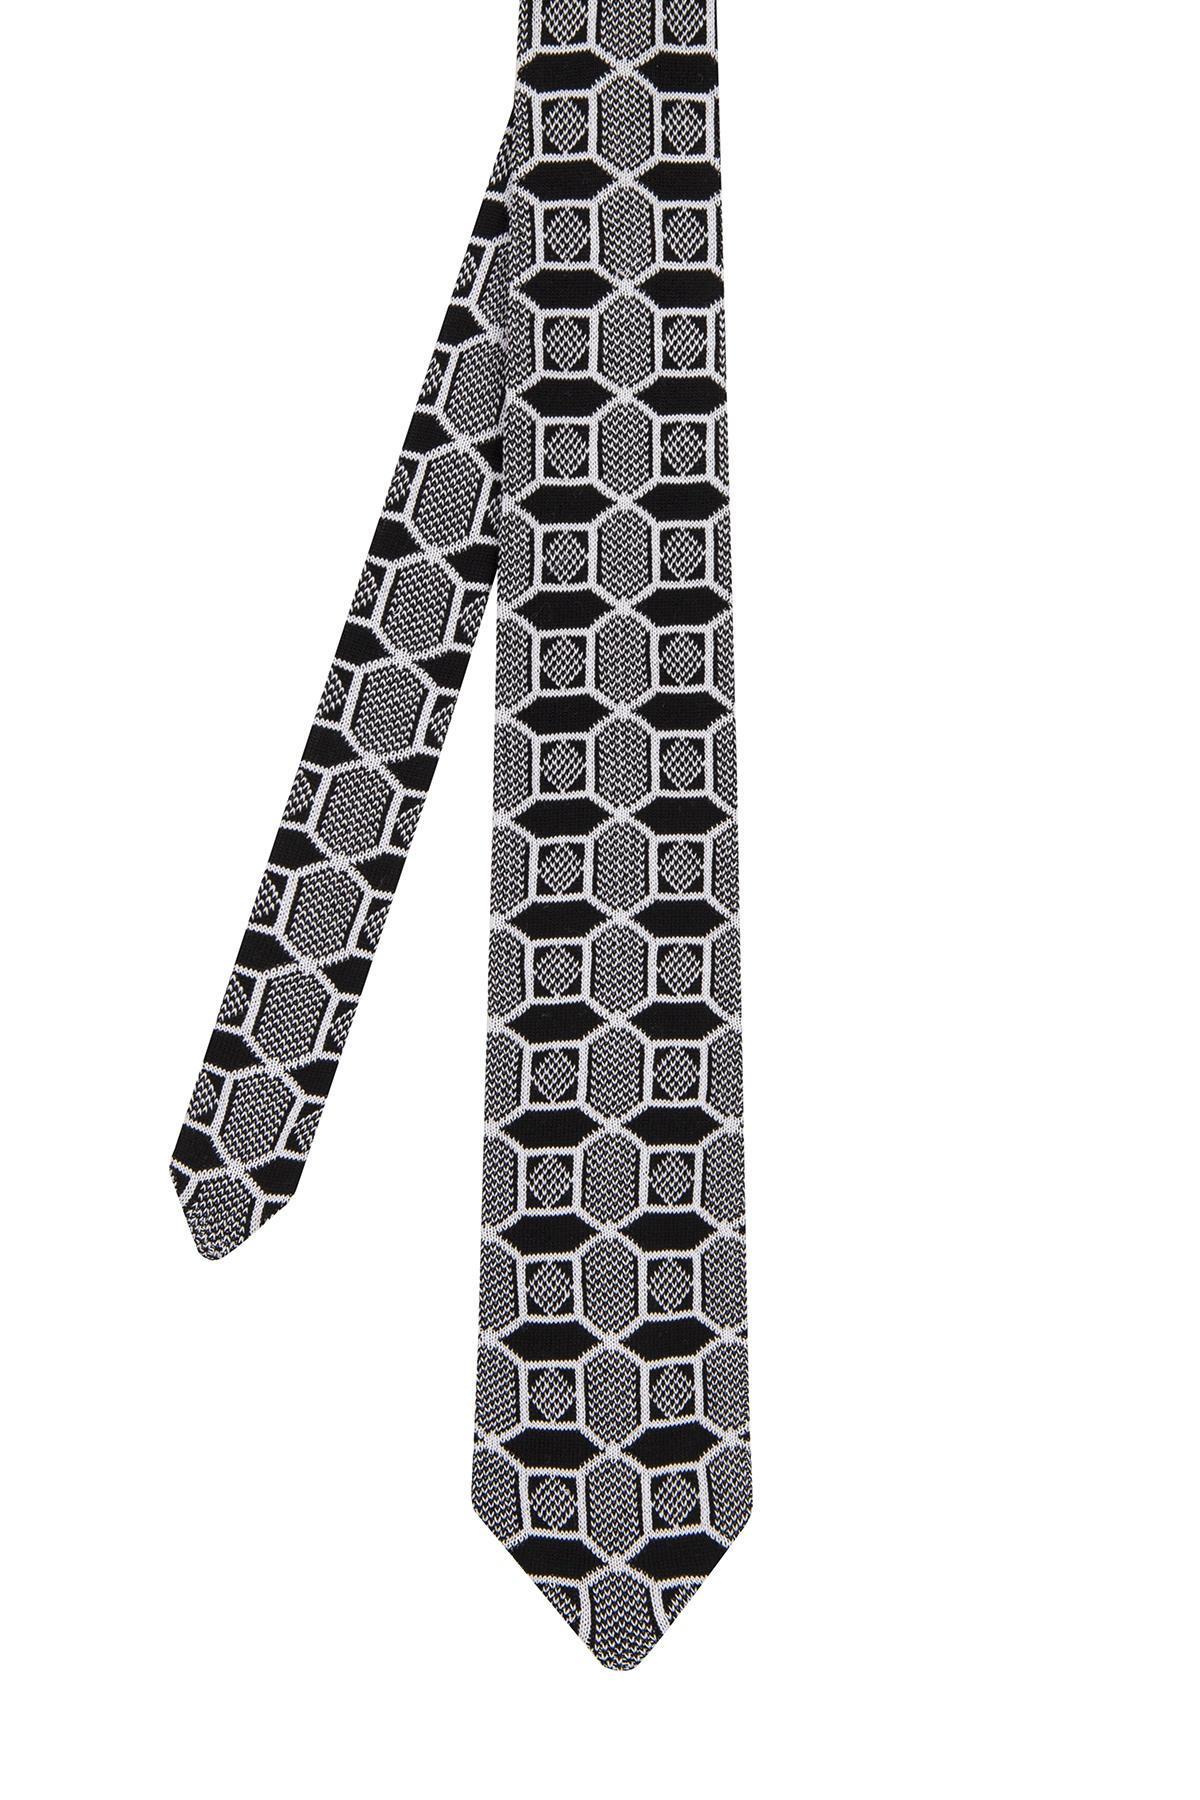 Siyah Karo Desenli Örgü Kravat